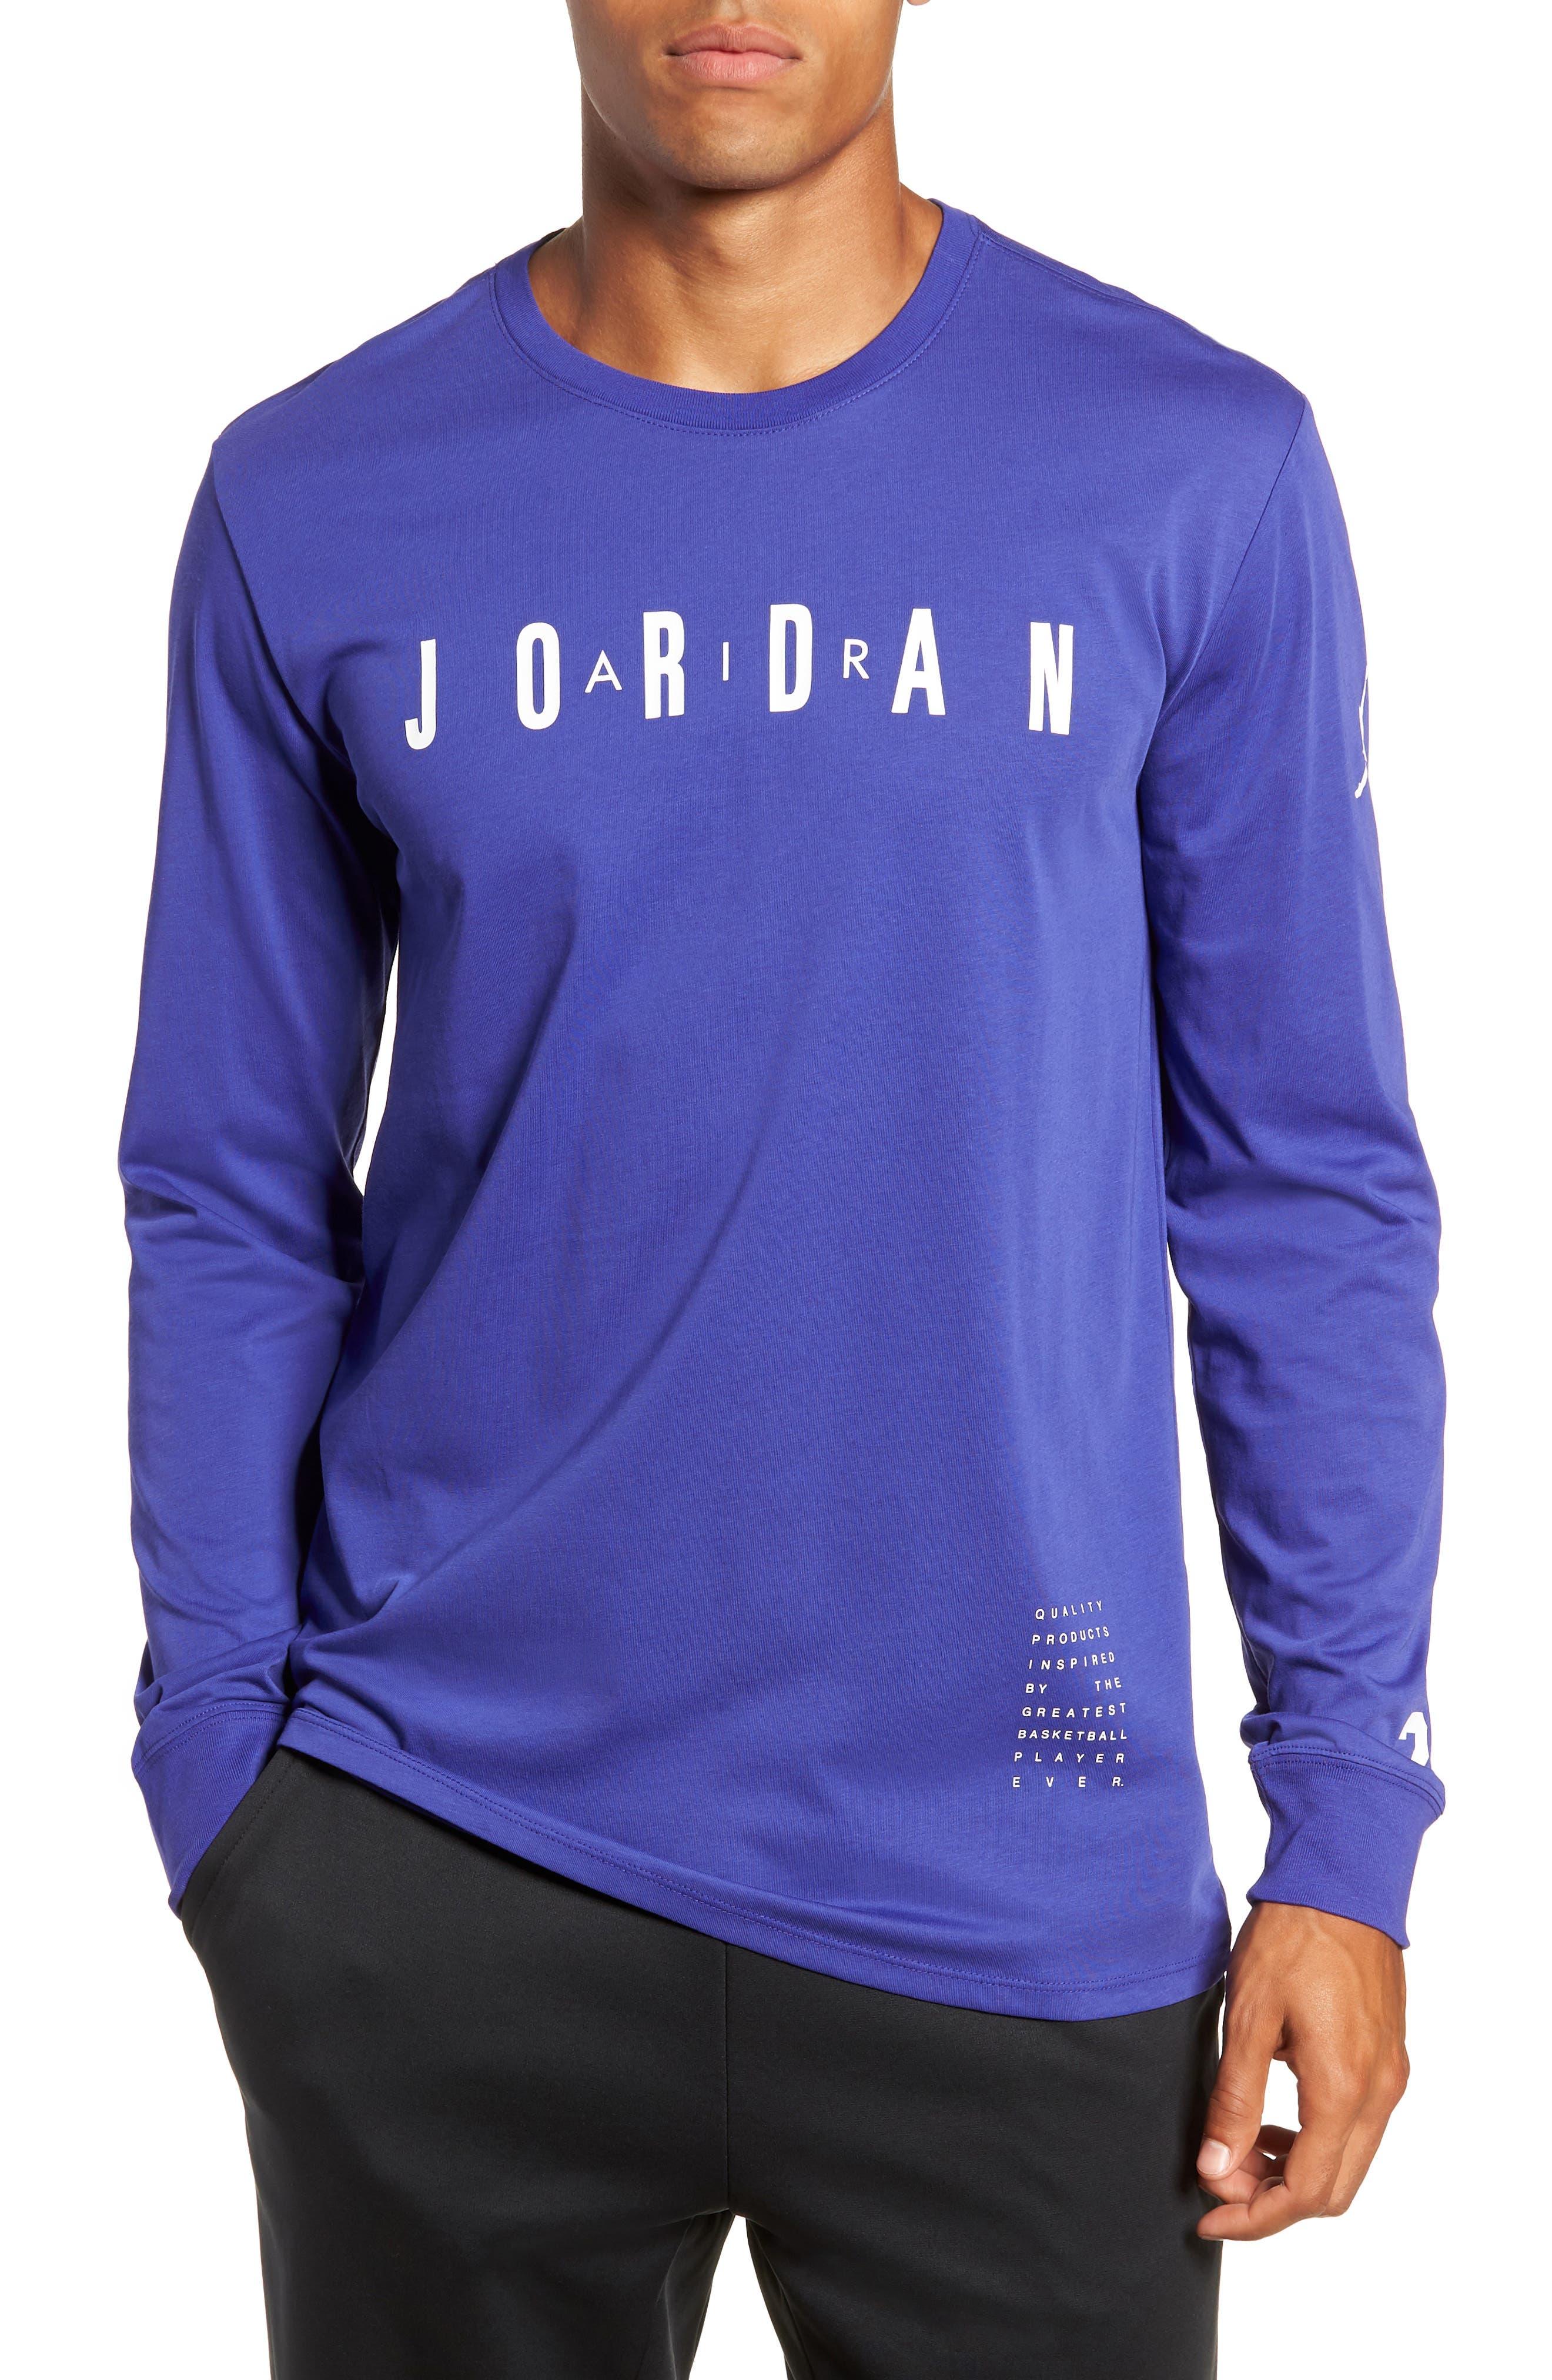 Nike Jordan Basketball T-Shirt, Blue